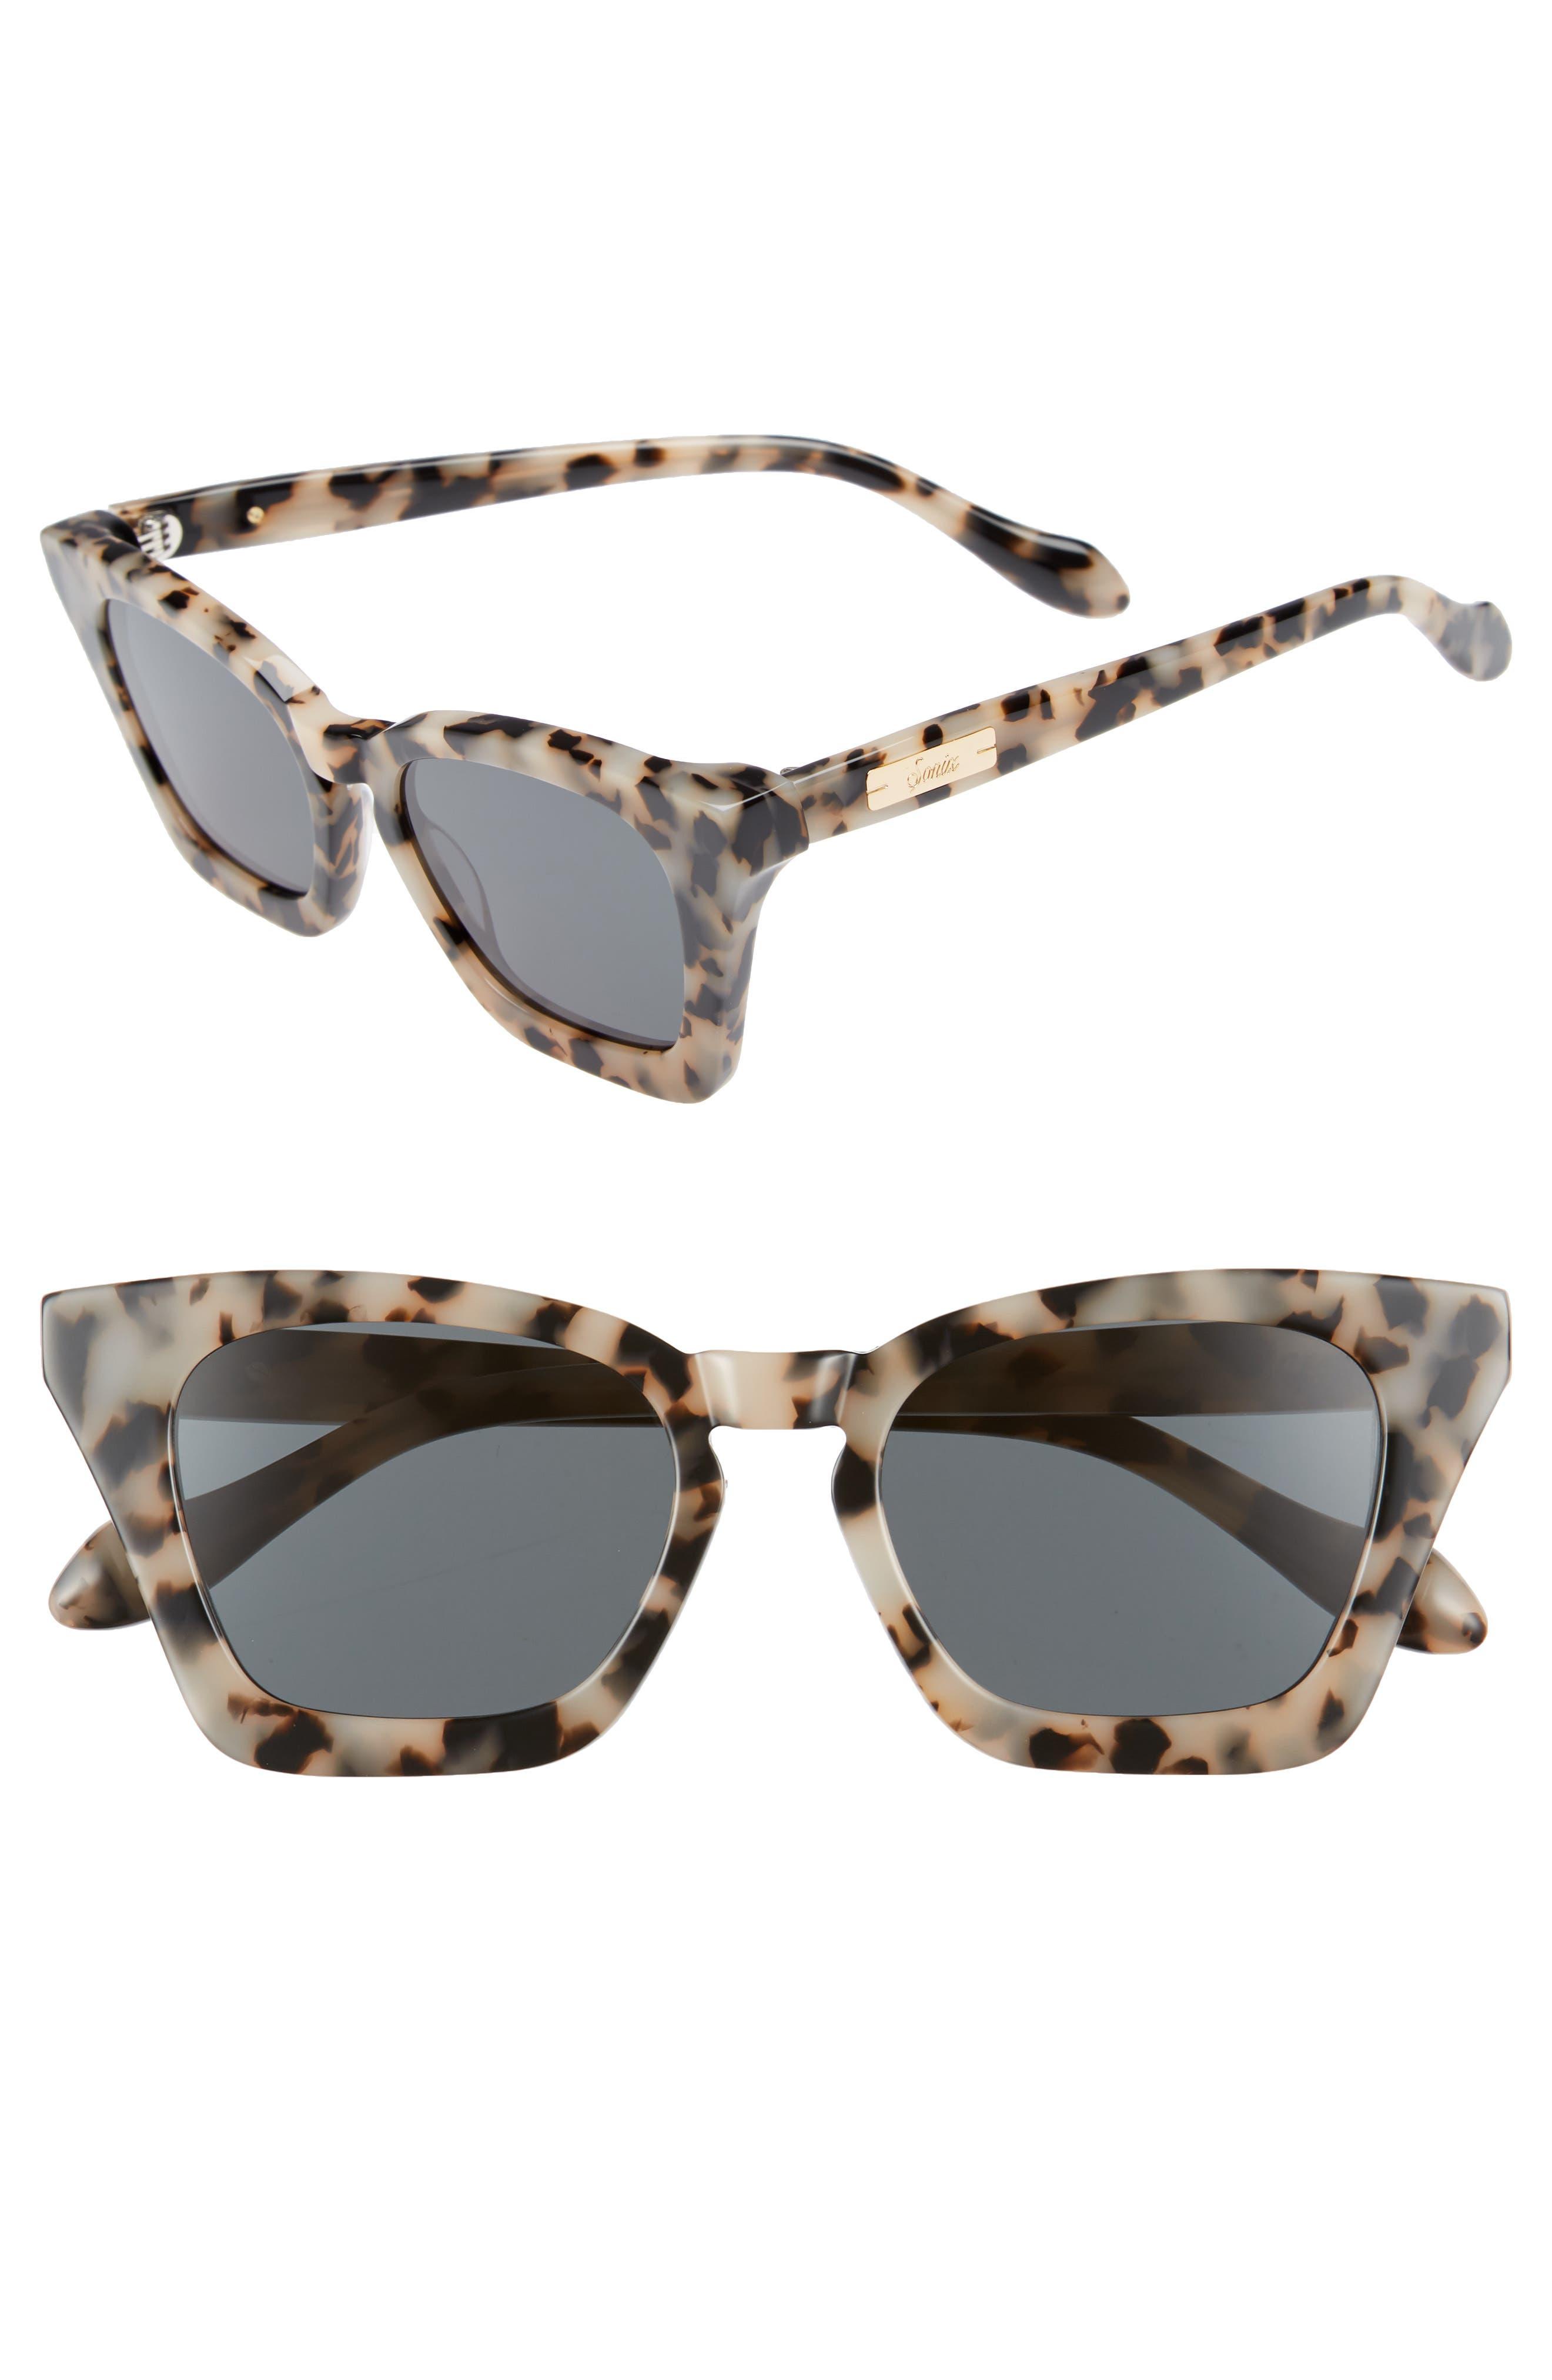 Ginza 50mm Cat Eye Sunglasses,                             Main thumbnail 1, color,                             Milk Tortoise/ Black Solid